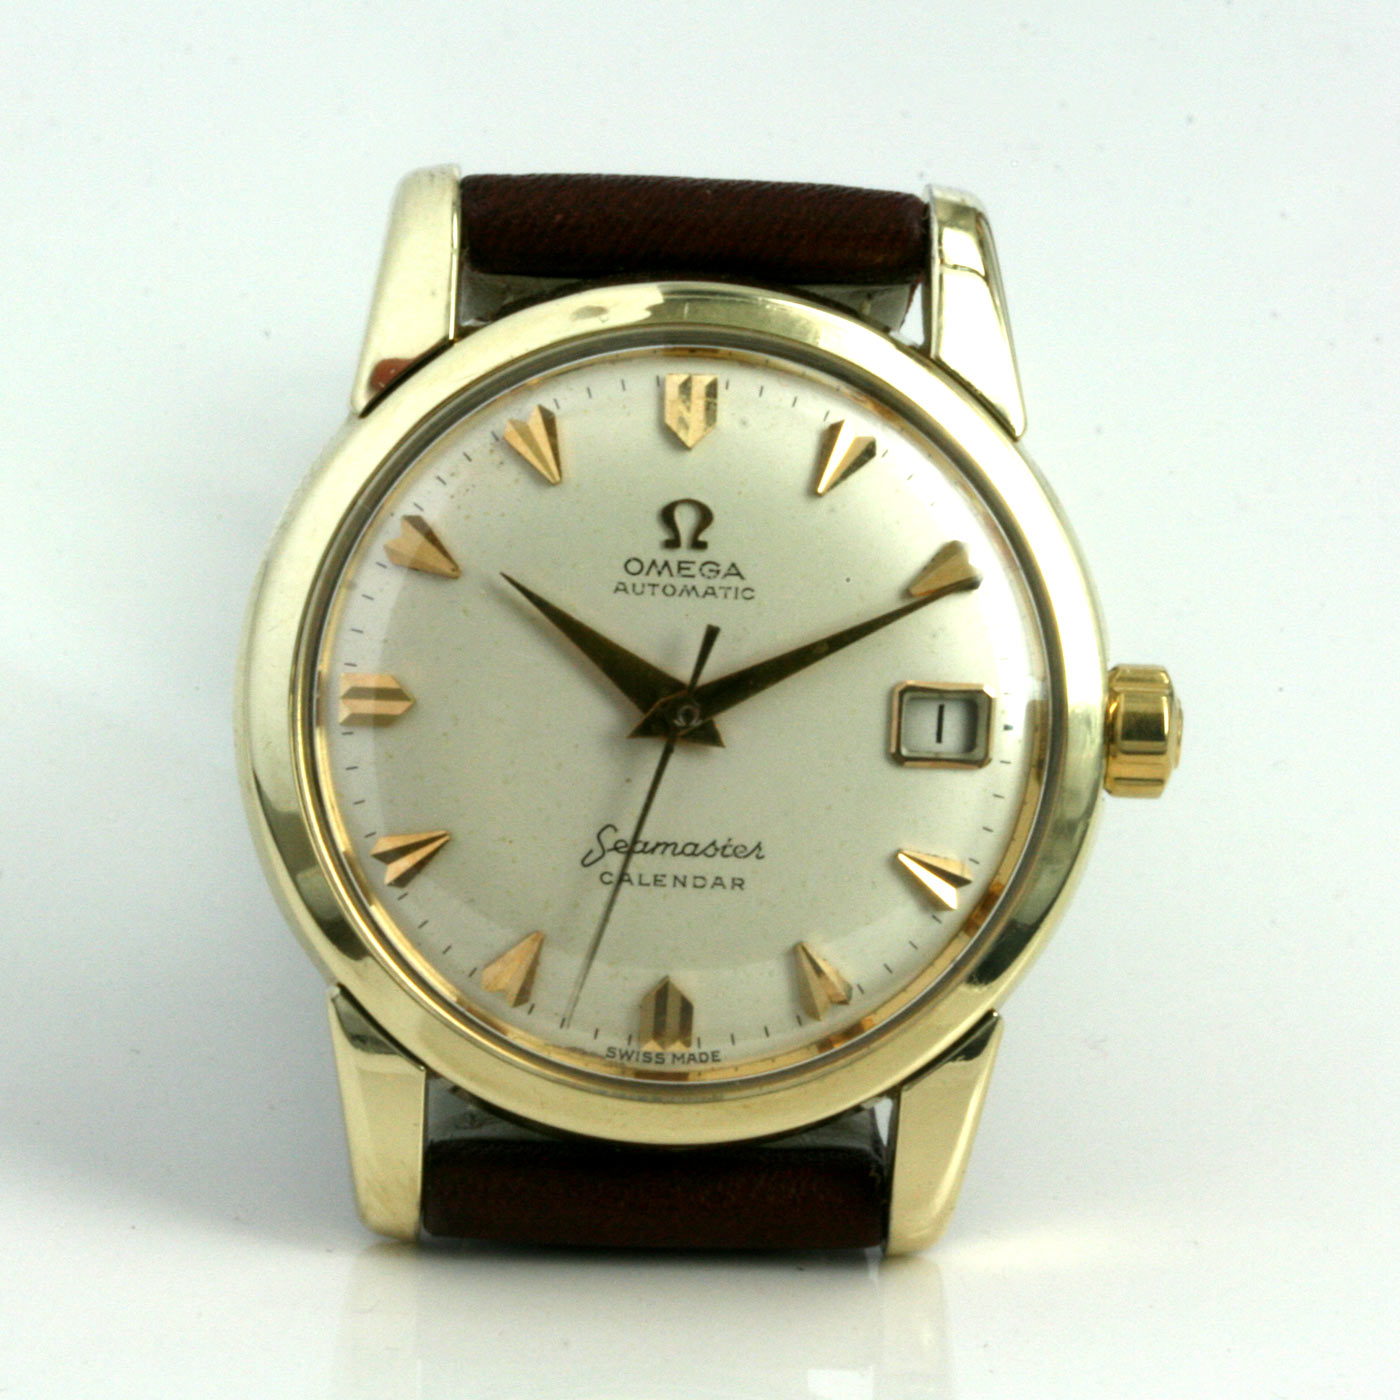 Omega Seamaster Calendar Vintage : Buy omega seamaster calendar from sold items